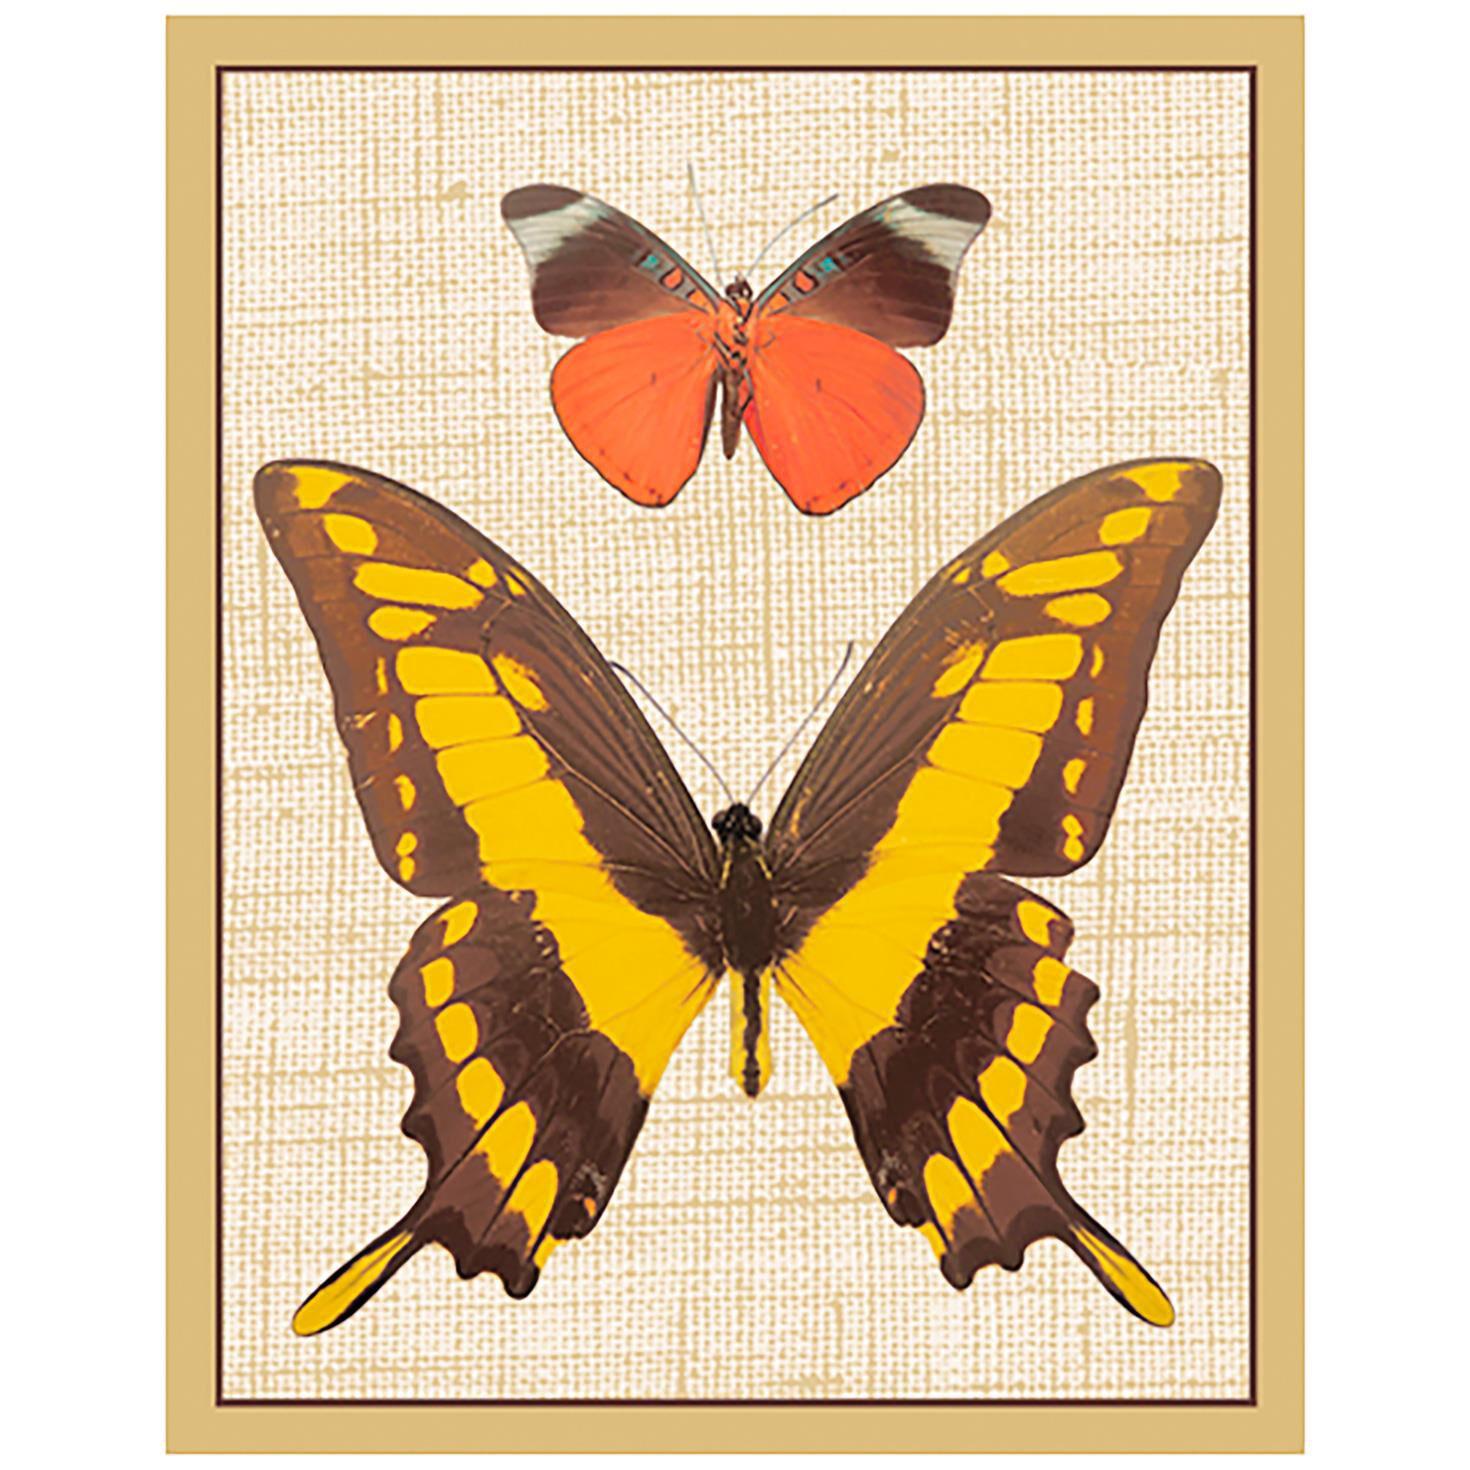 picture regarding Printable Bridge Tallies named Caspari Deyrolle Butterflies Style Bridge Tally Sheets, Mounted of 12